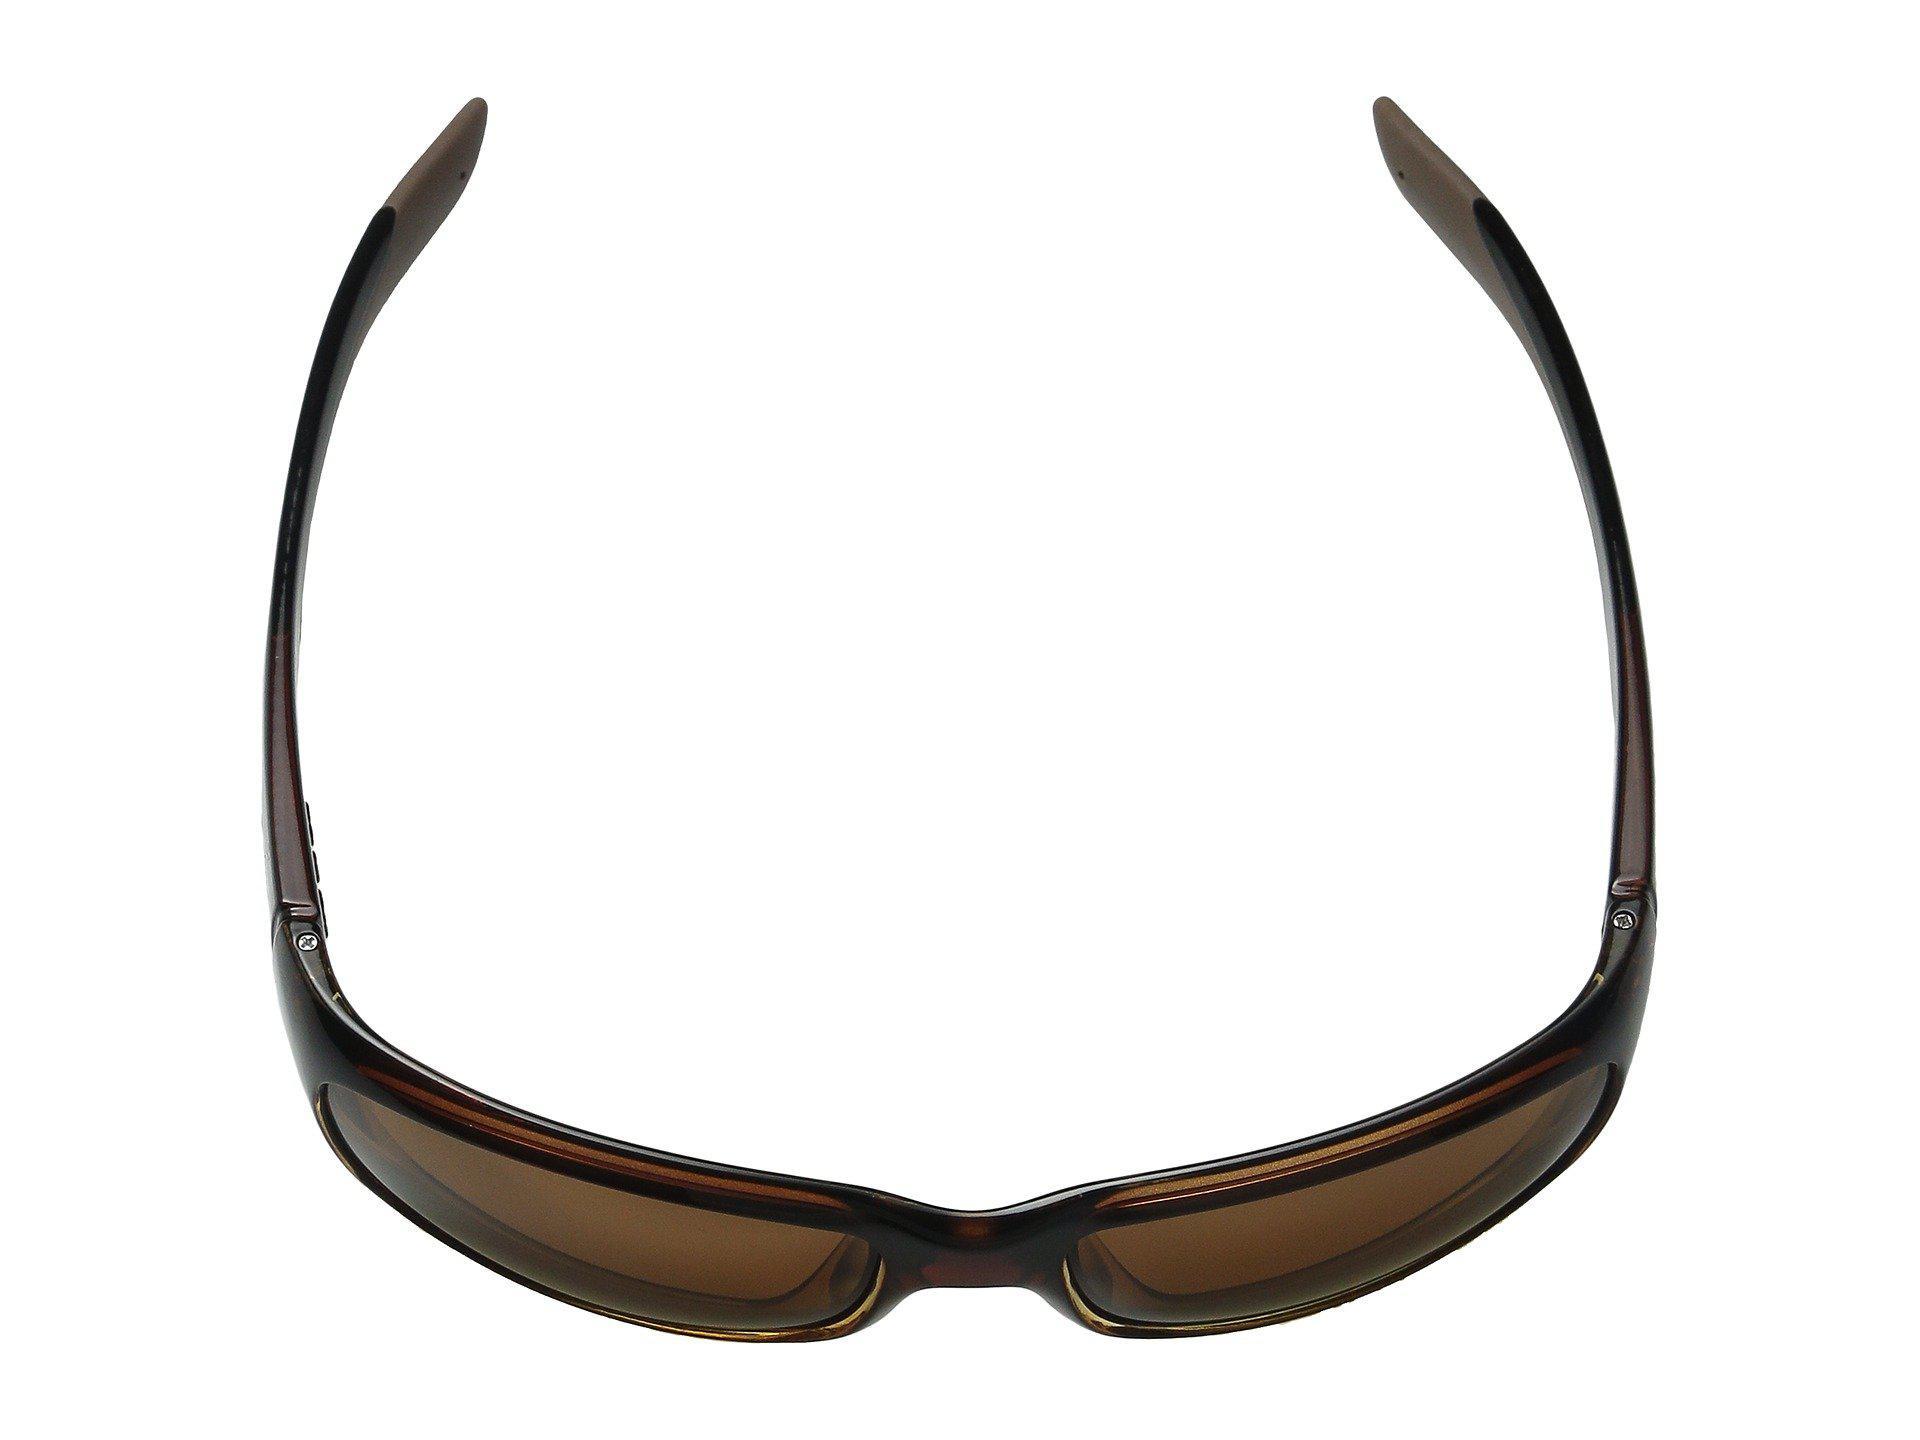 4af61f8097 Lyst - Native Eyewear Kannah (crimson gray) Sport Sunglasses in ...